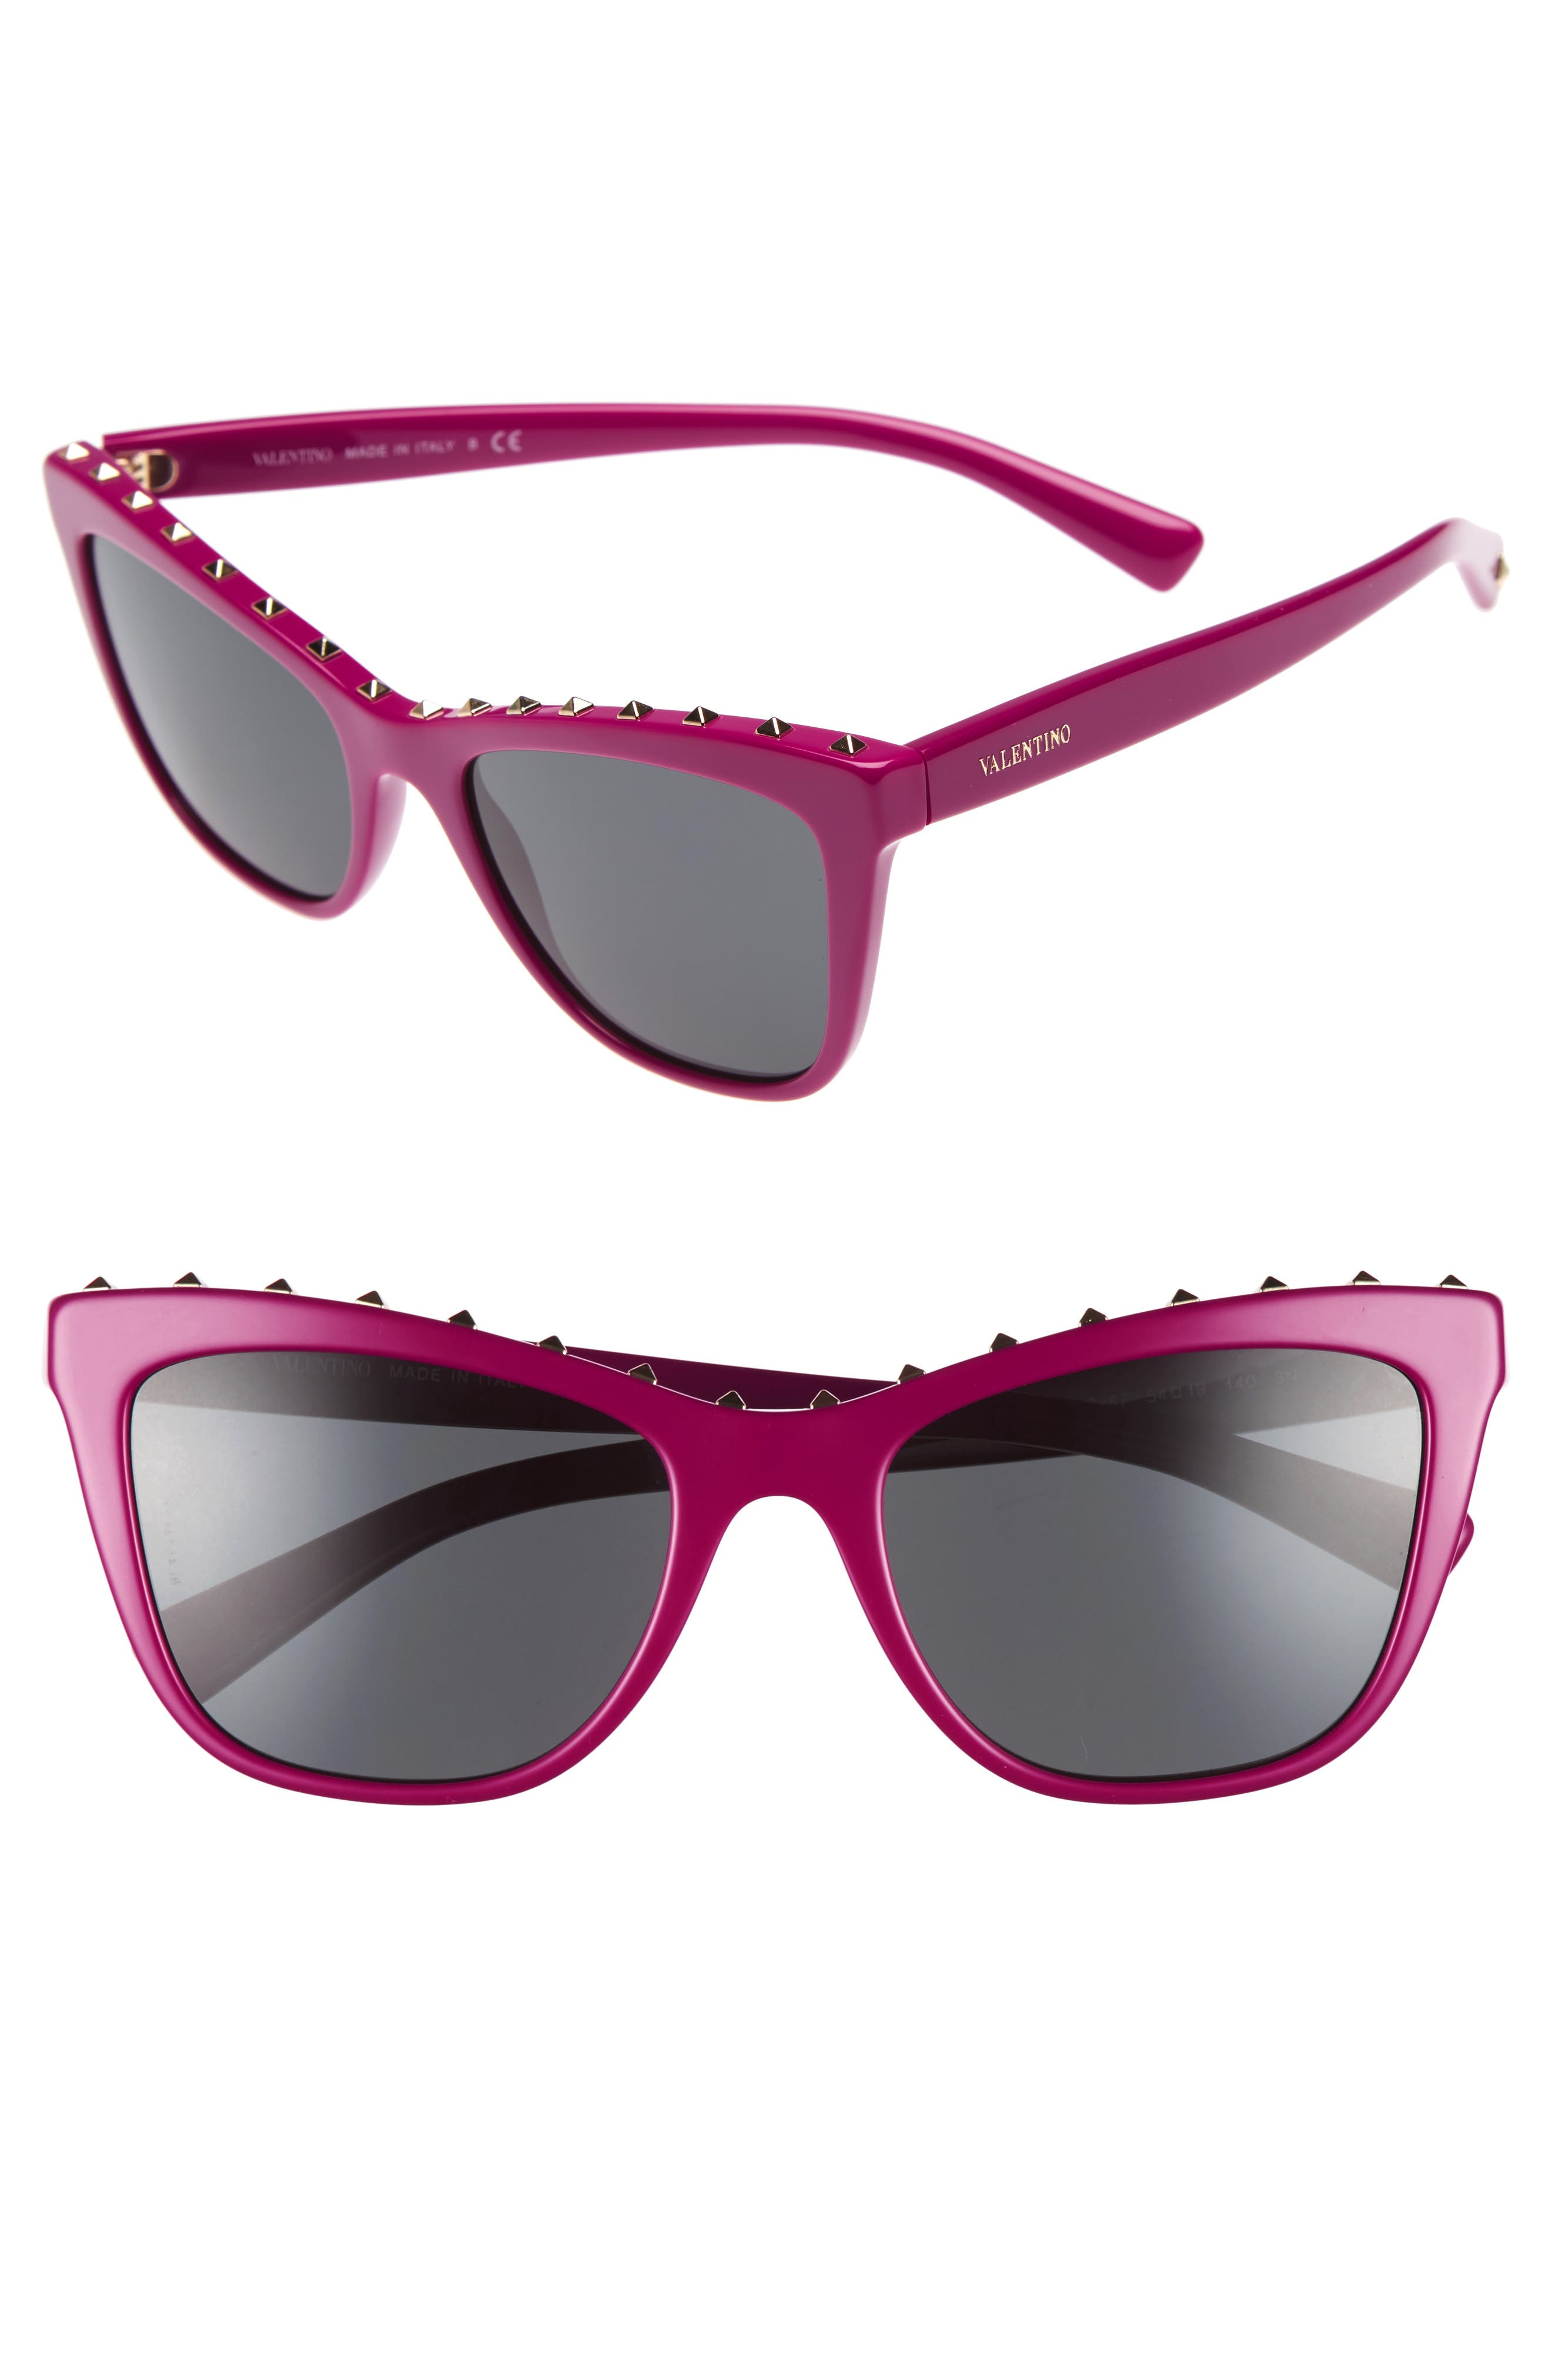 Rockstud 54mm Cat Eye Sunglasses,                         Main,                         color, 500